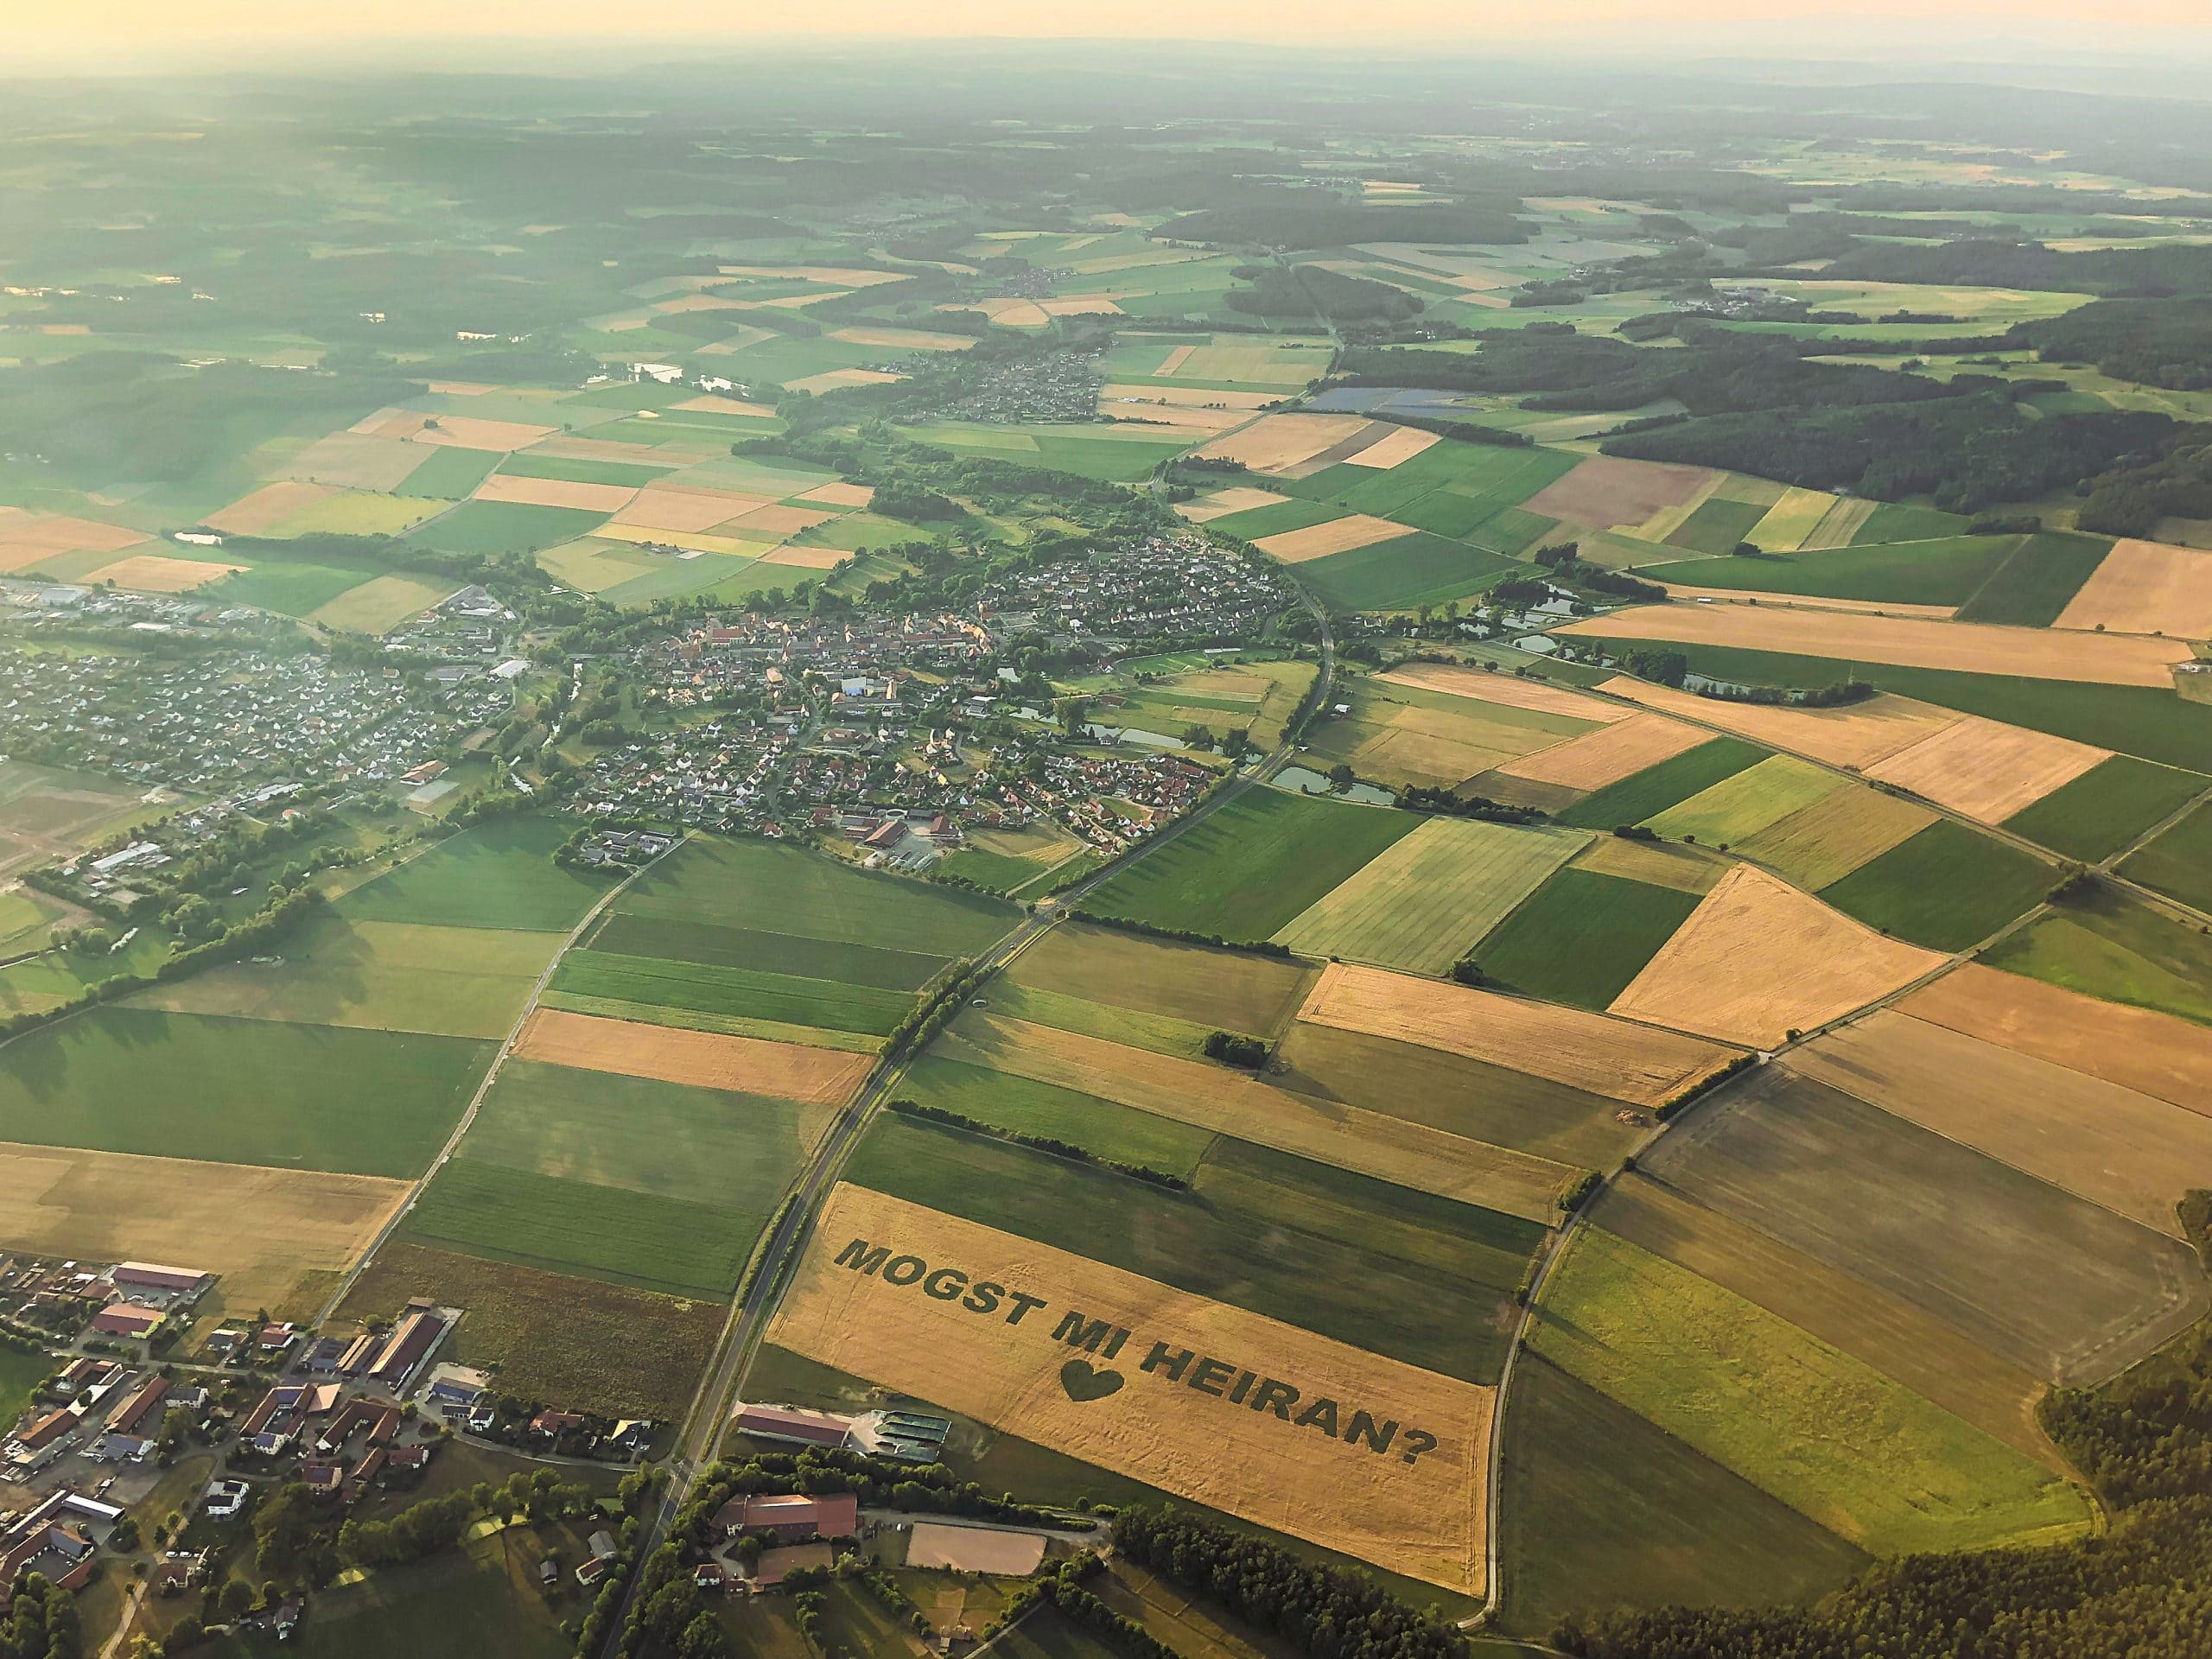 Lkl Amberg Sulzbach